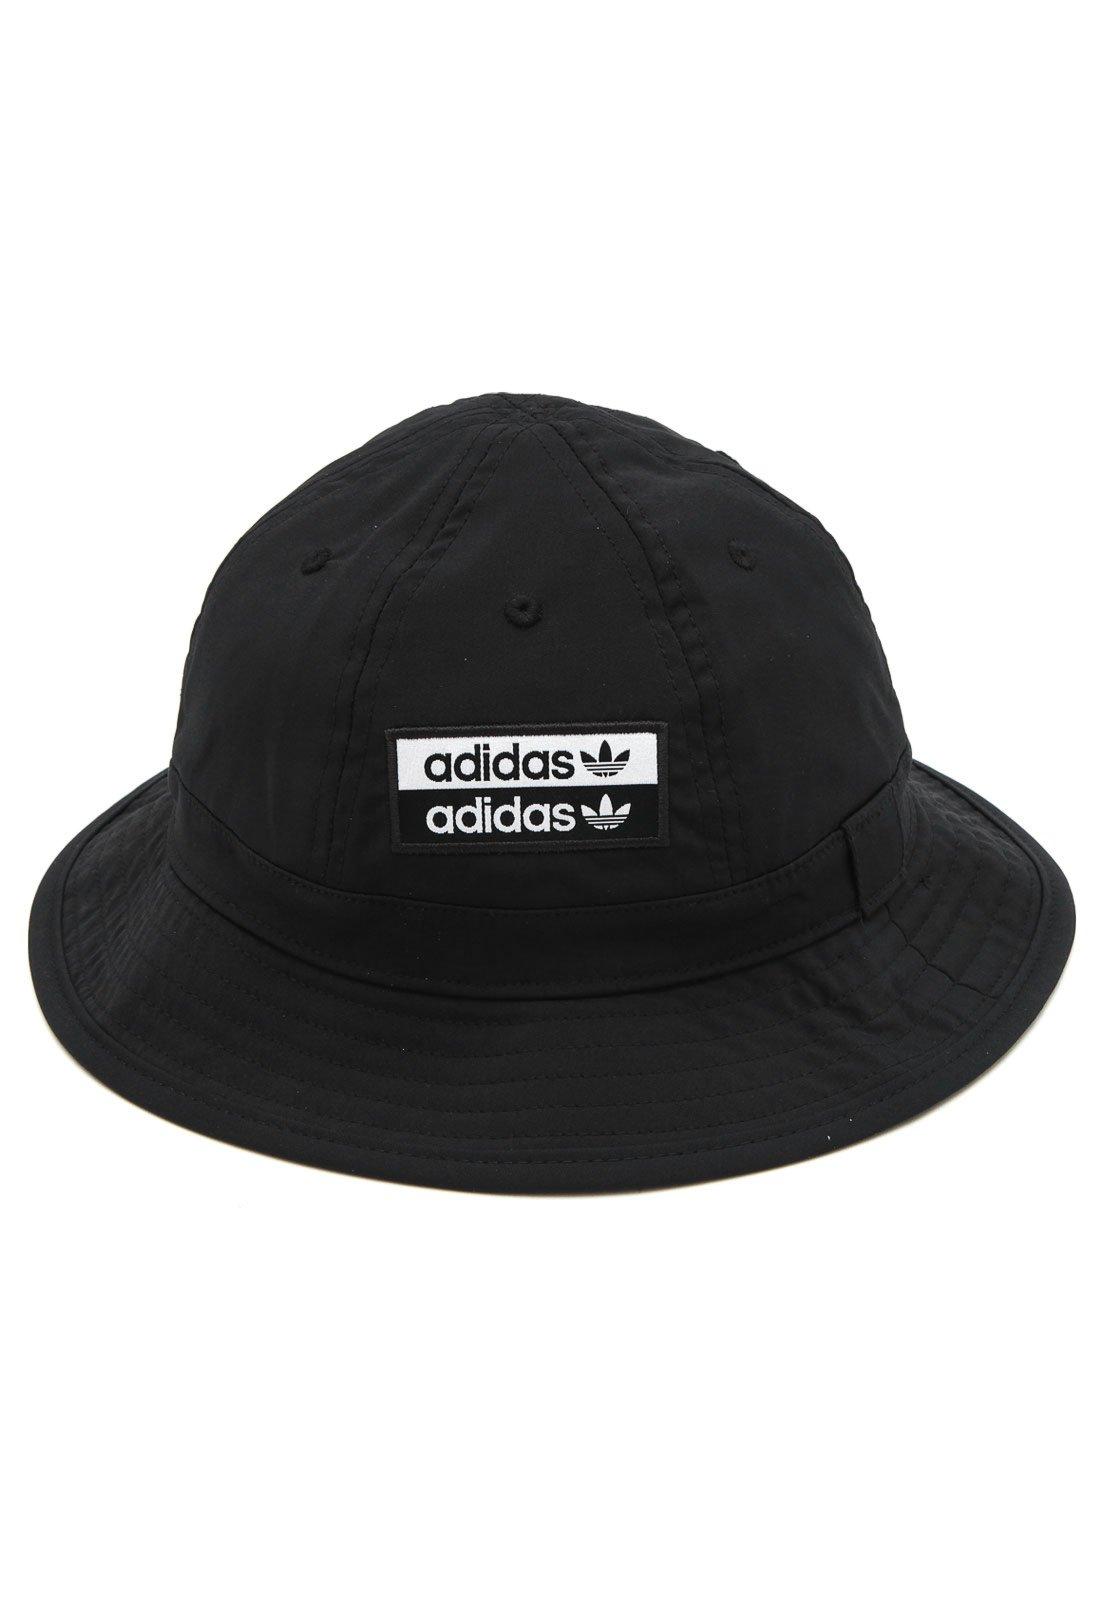 Chapeu Adidas Originals Chapeu Bucket Vocal Preto Compre Agora Dafiti Brasil